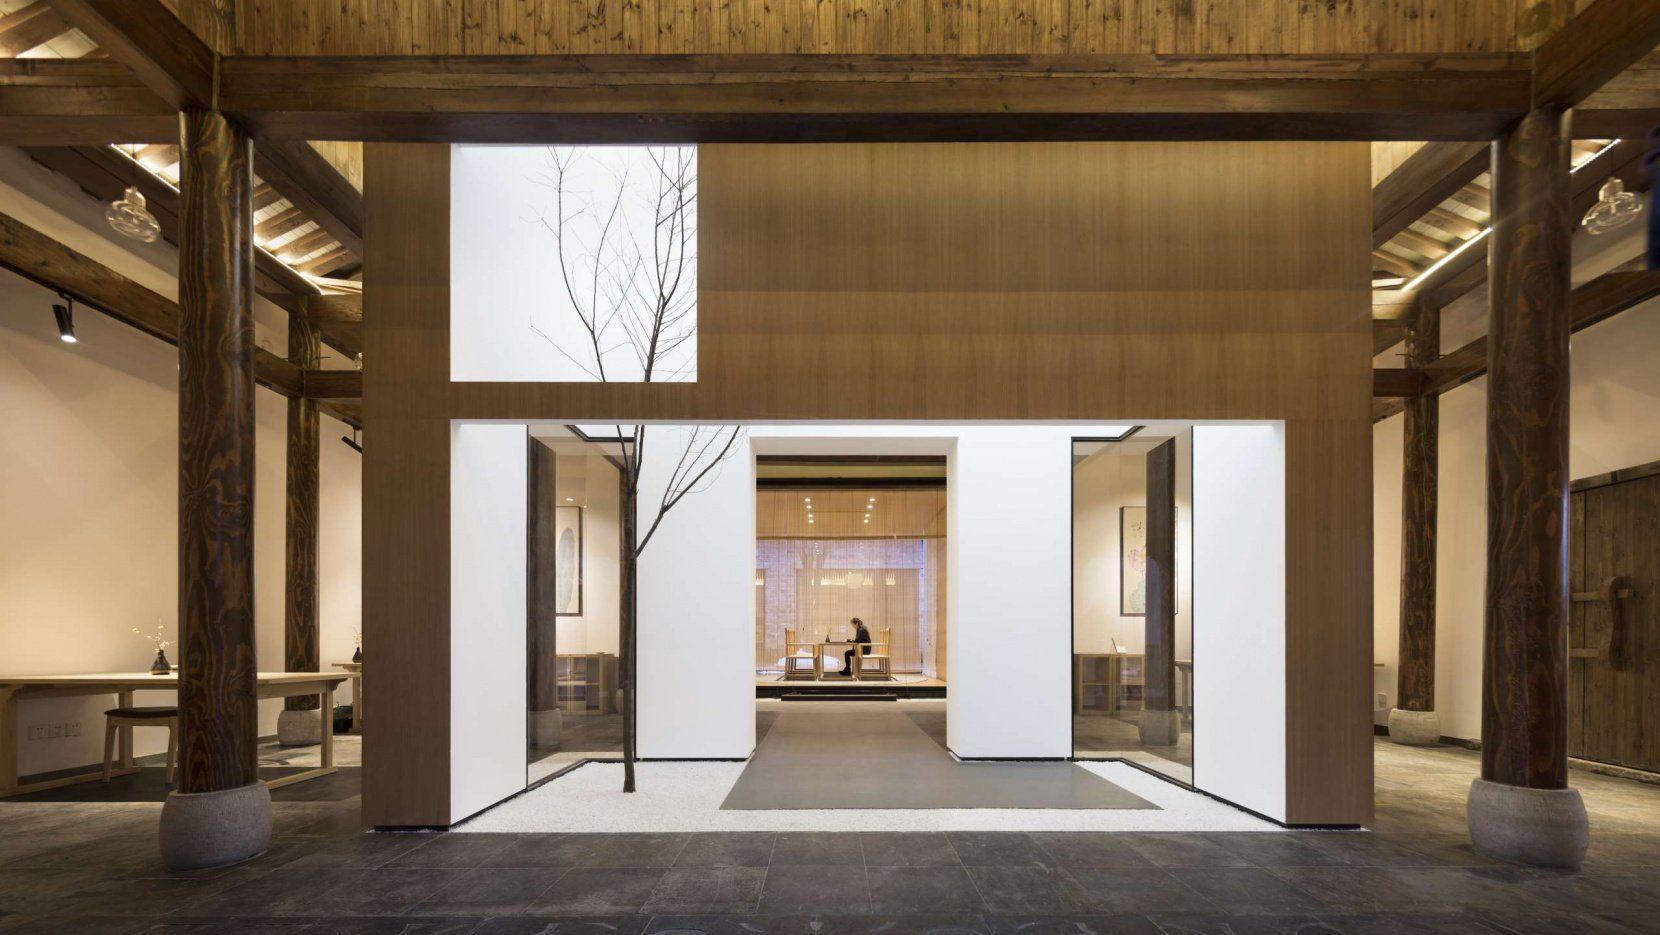 Contemporary architecture reinvigorates aging fishing village in